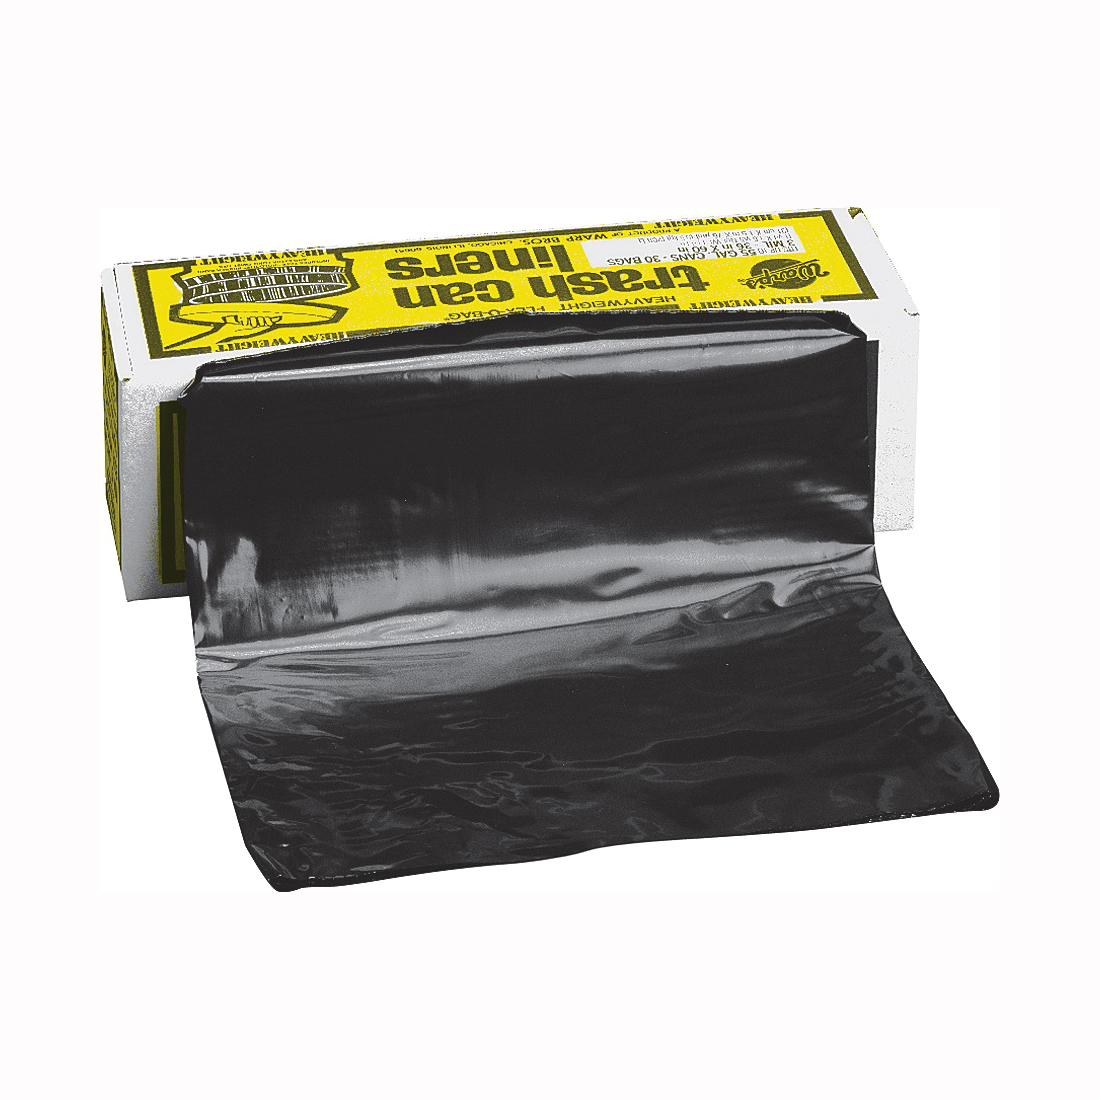 Picture of Warp's FLEX-O-BAG HB55-30 Trash Can Liner, 55 gal Capacity, Plastic, Black